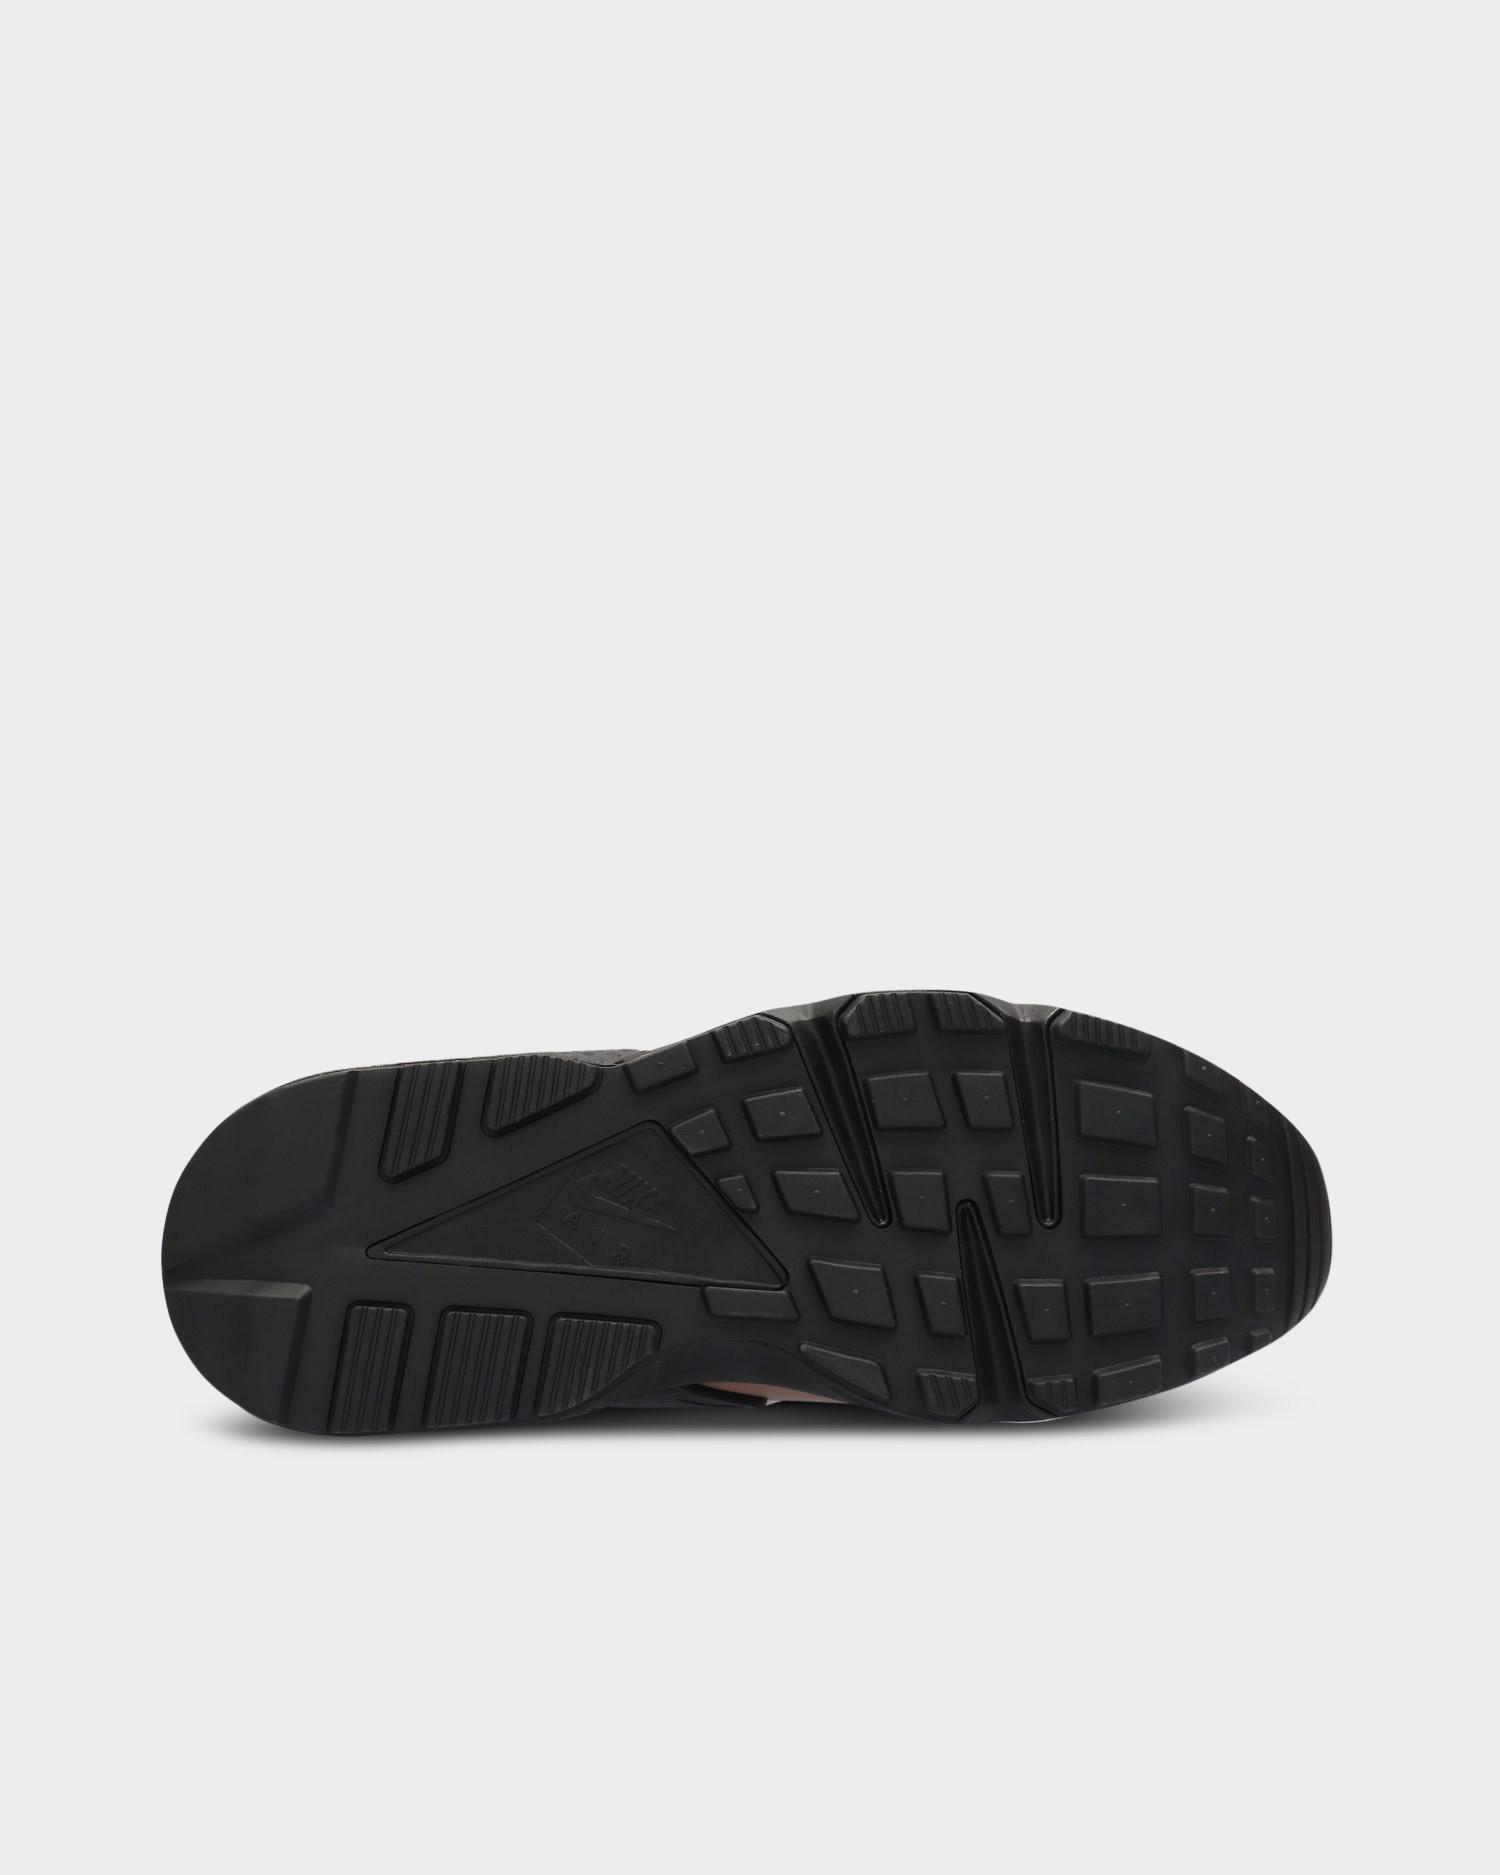 Nike Air HuaracheToadstool/Black-Chestnut Brown